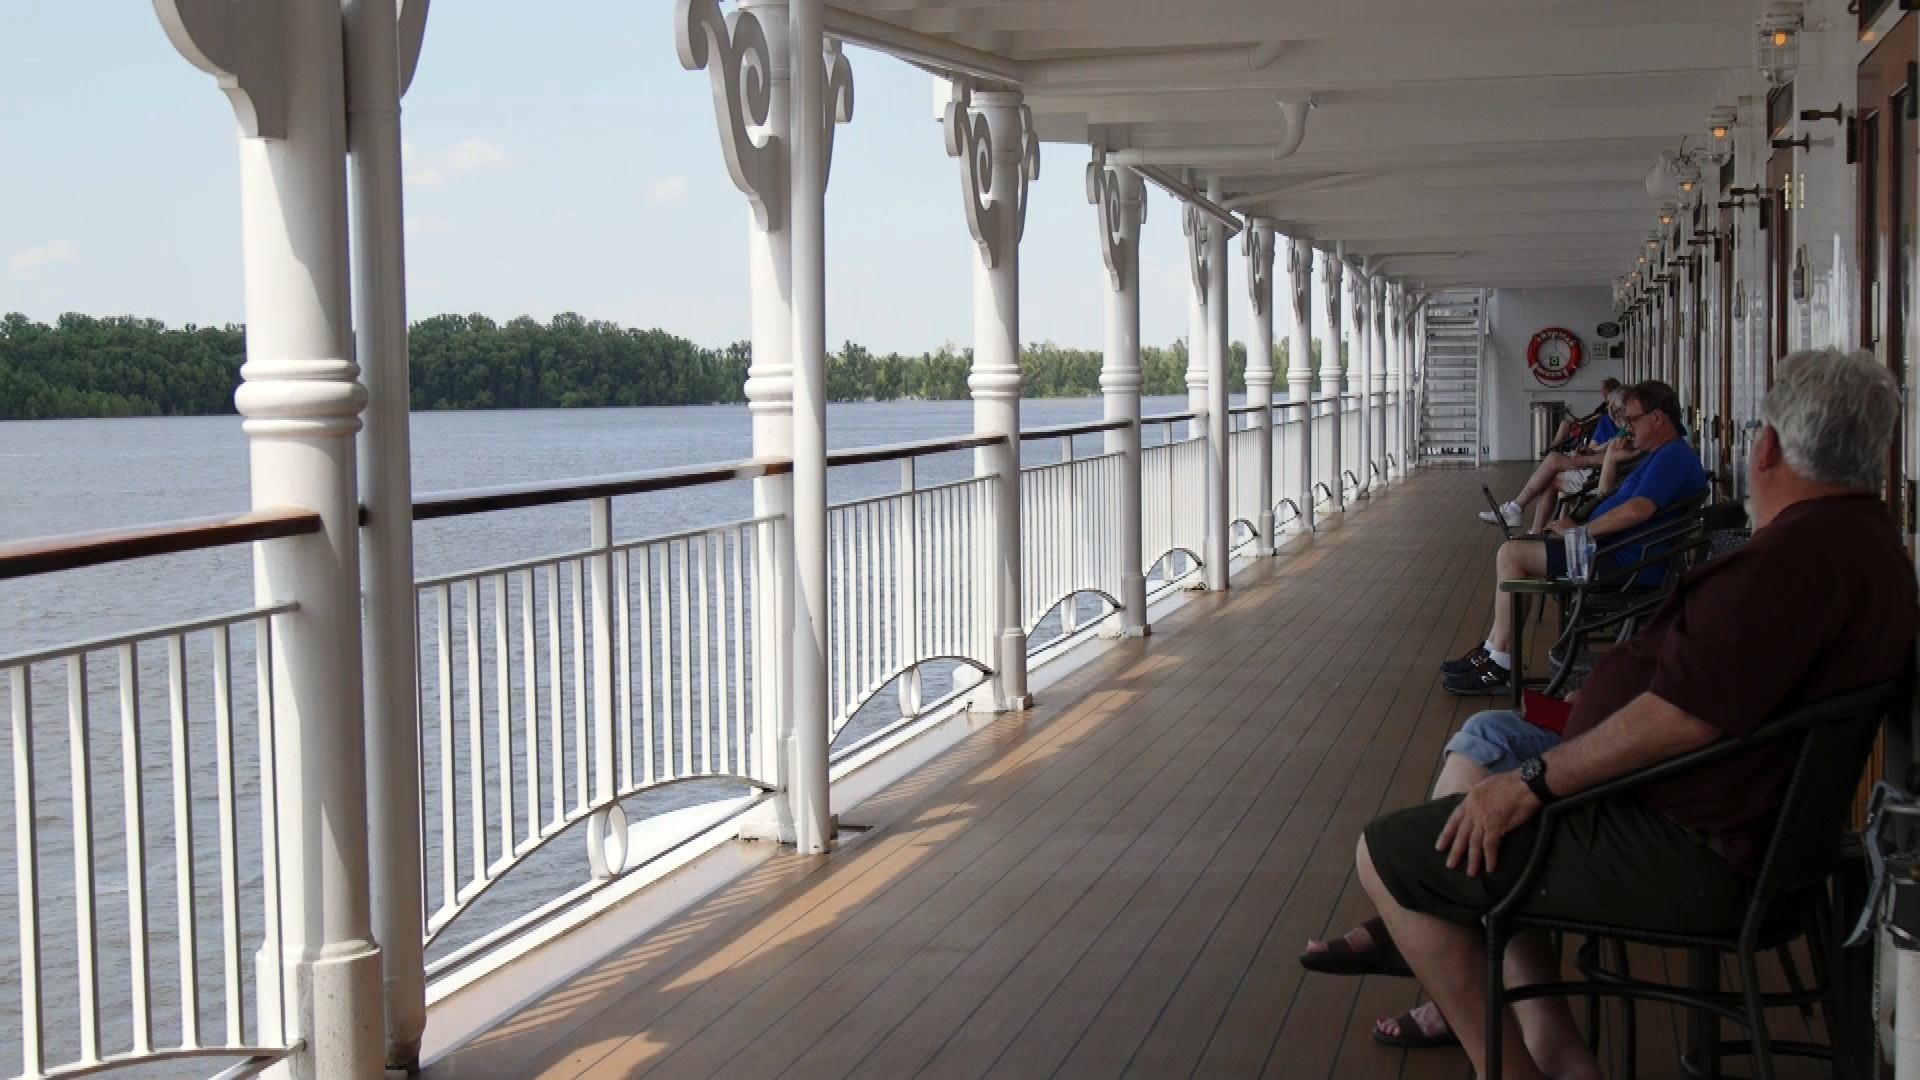 passengers sit along the veranda aboard the American Queen